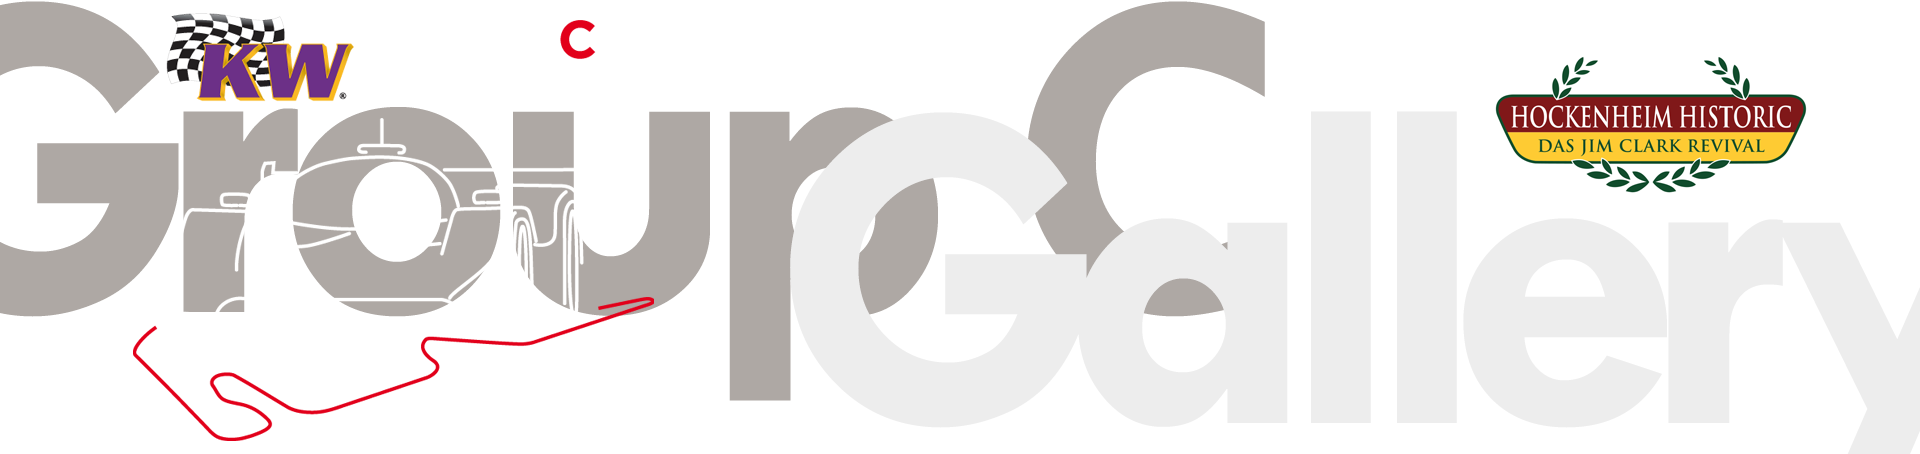 groupC-BHH_gallery-bgbot Kopie